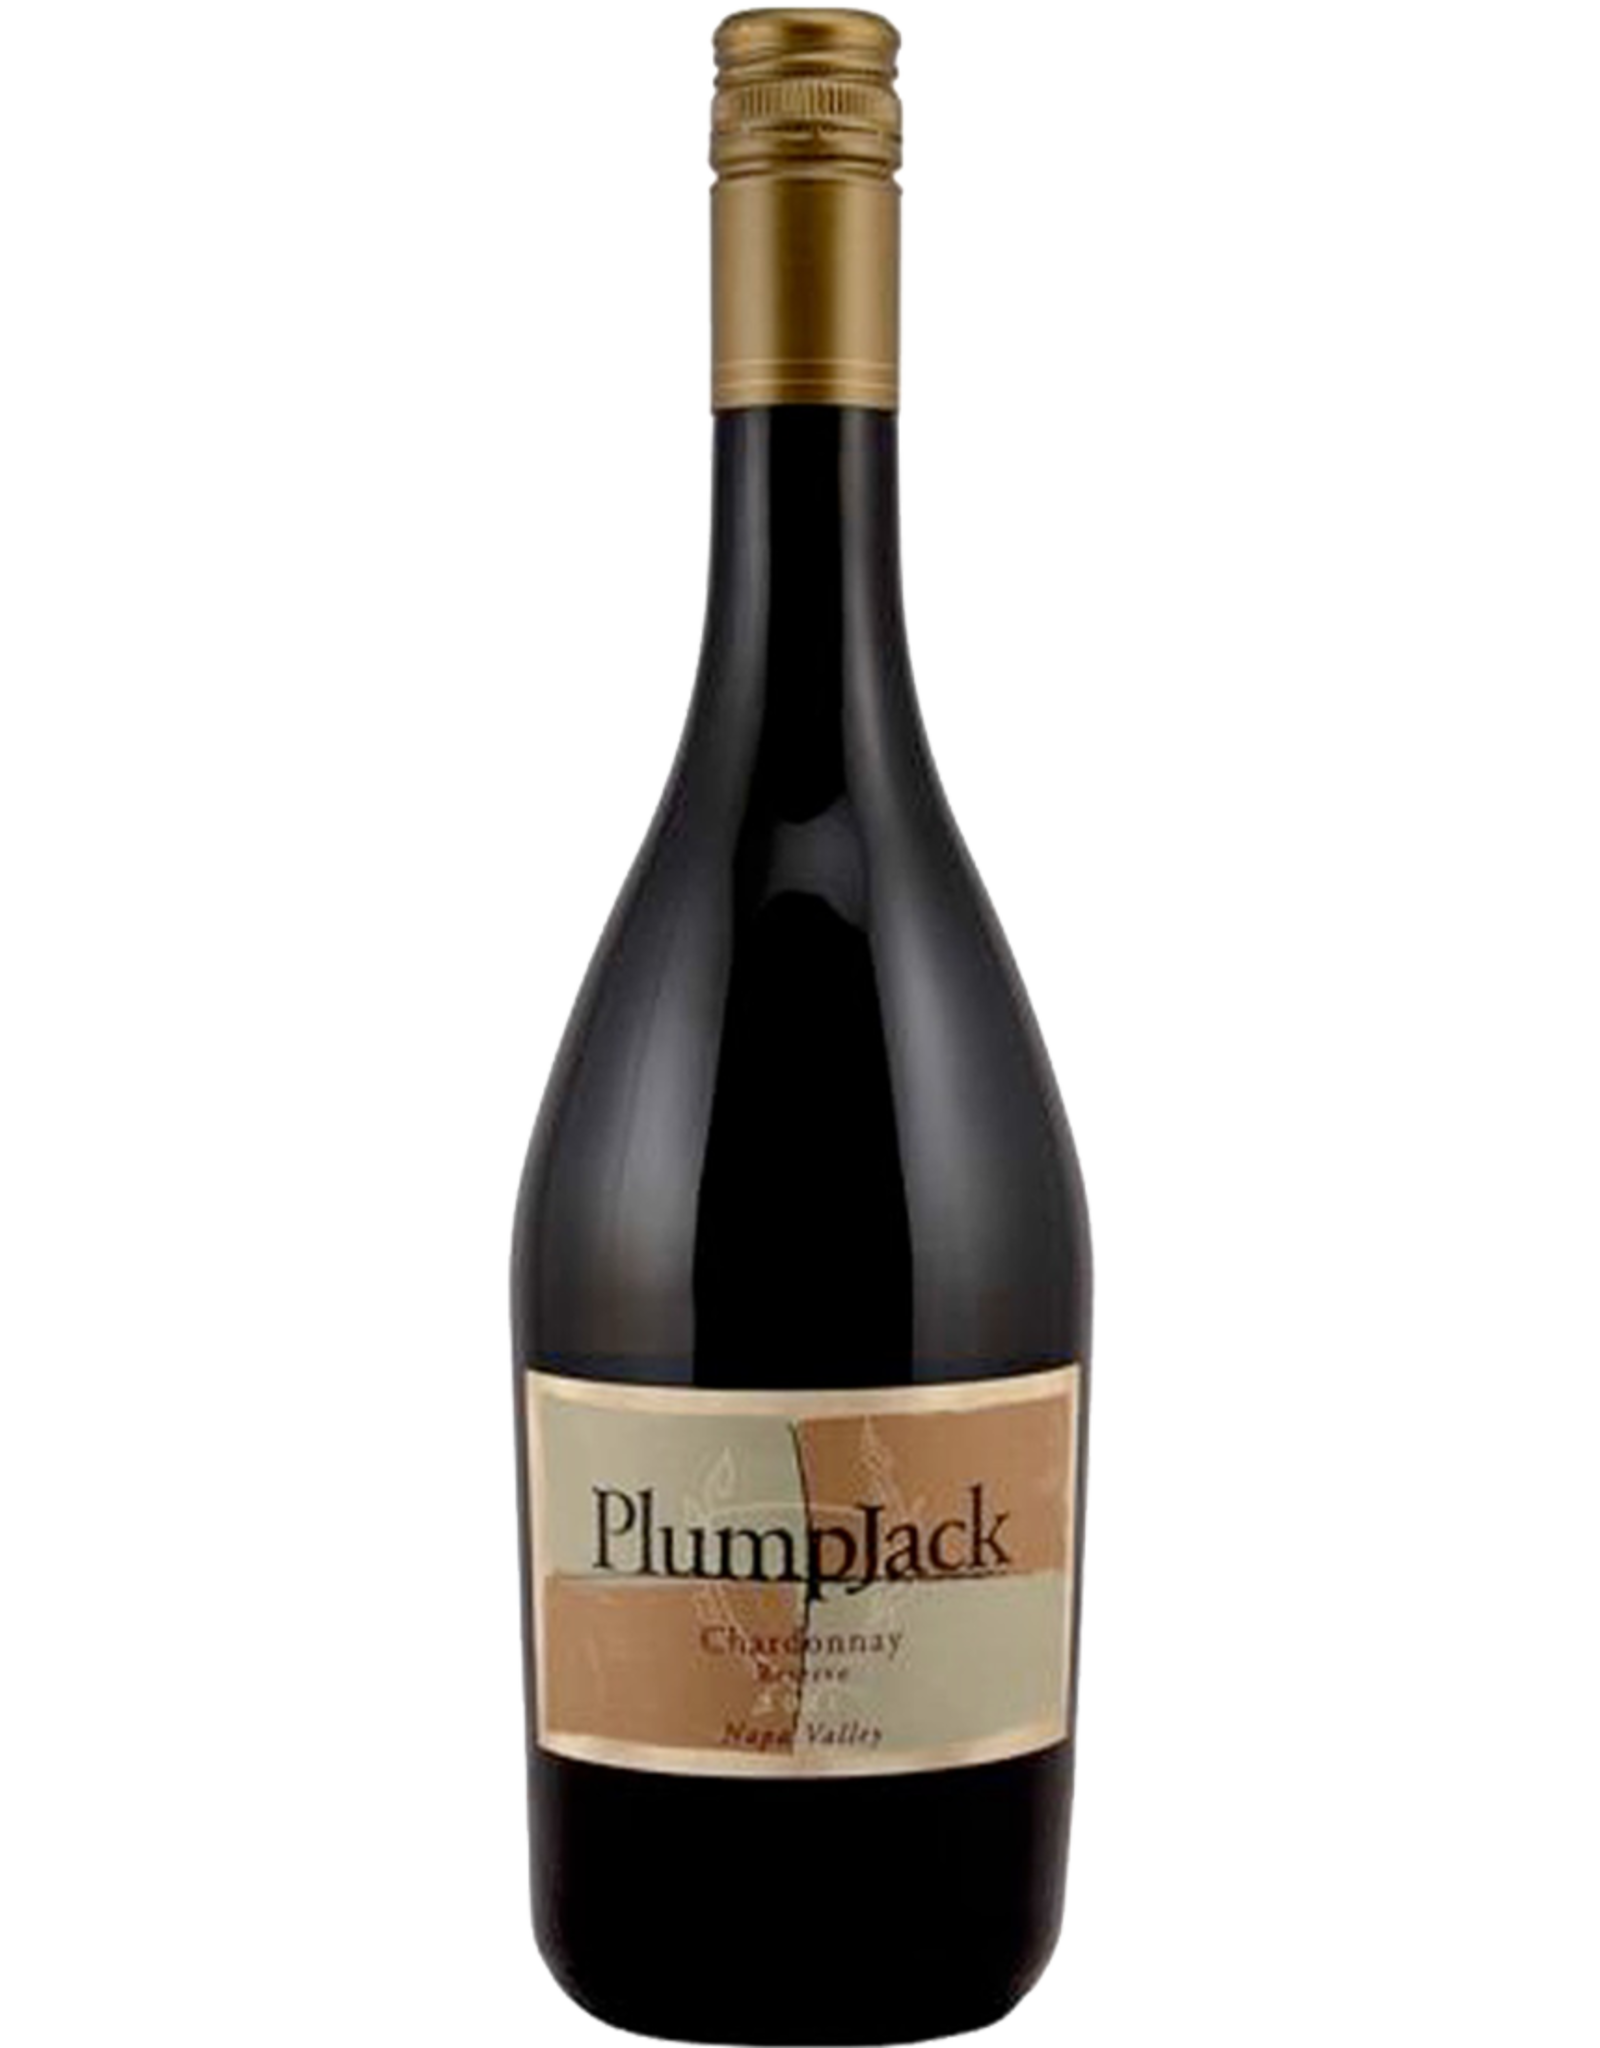 Plumpjack Reserve Chardonnay Napa 2019